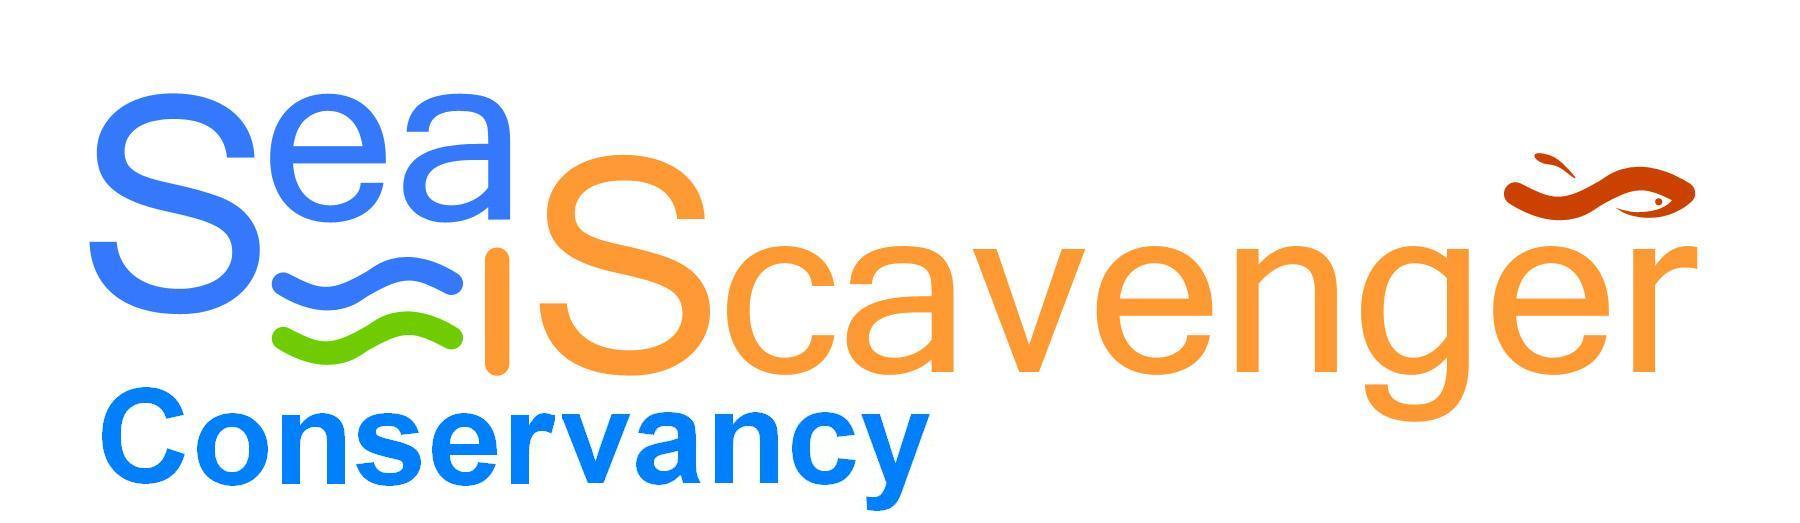 Sea Scavenger Conservancy